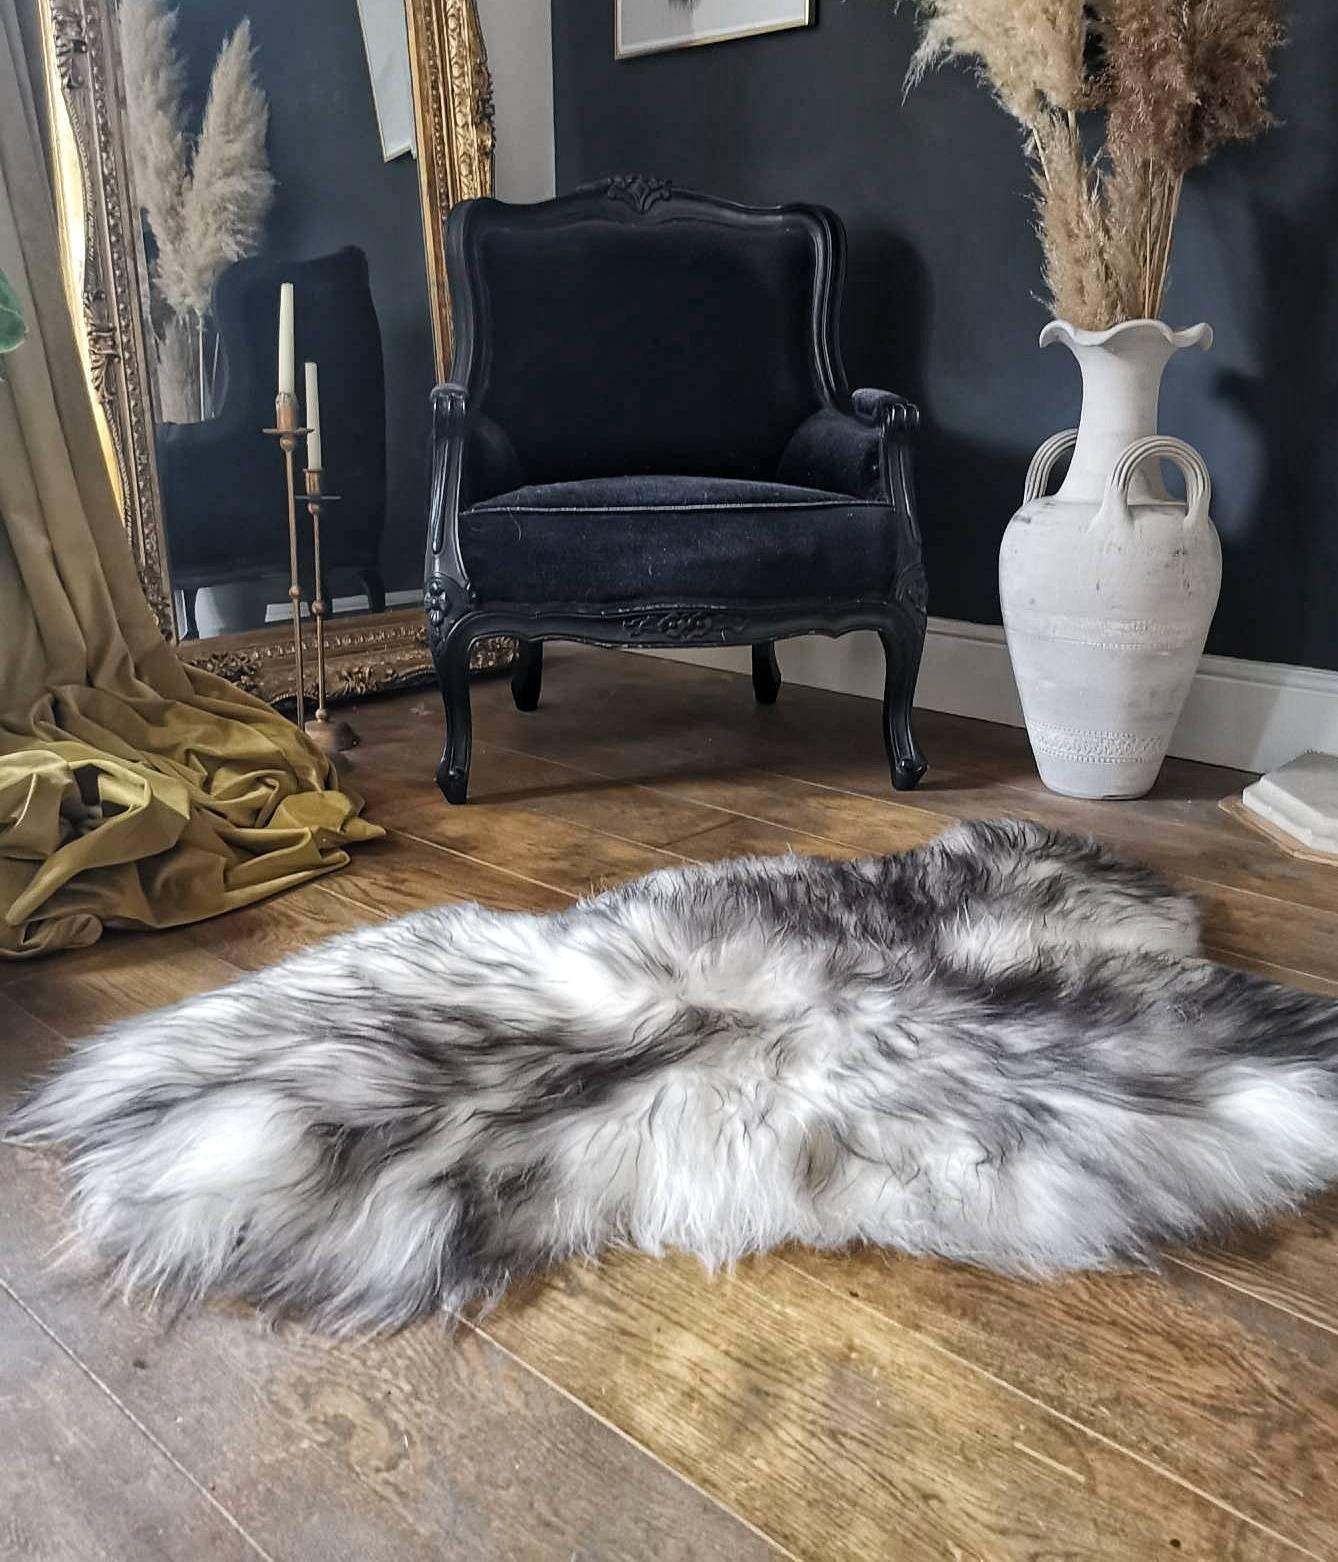 Icelandic Sheepskin Rug Black And White